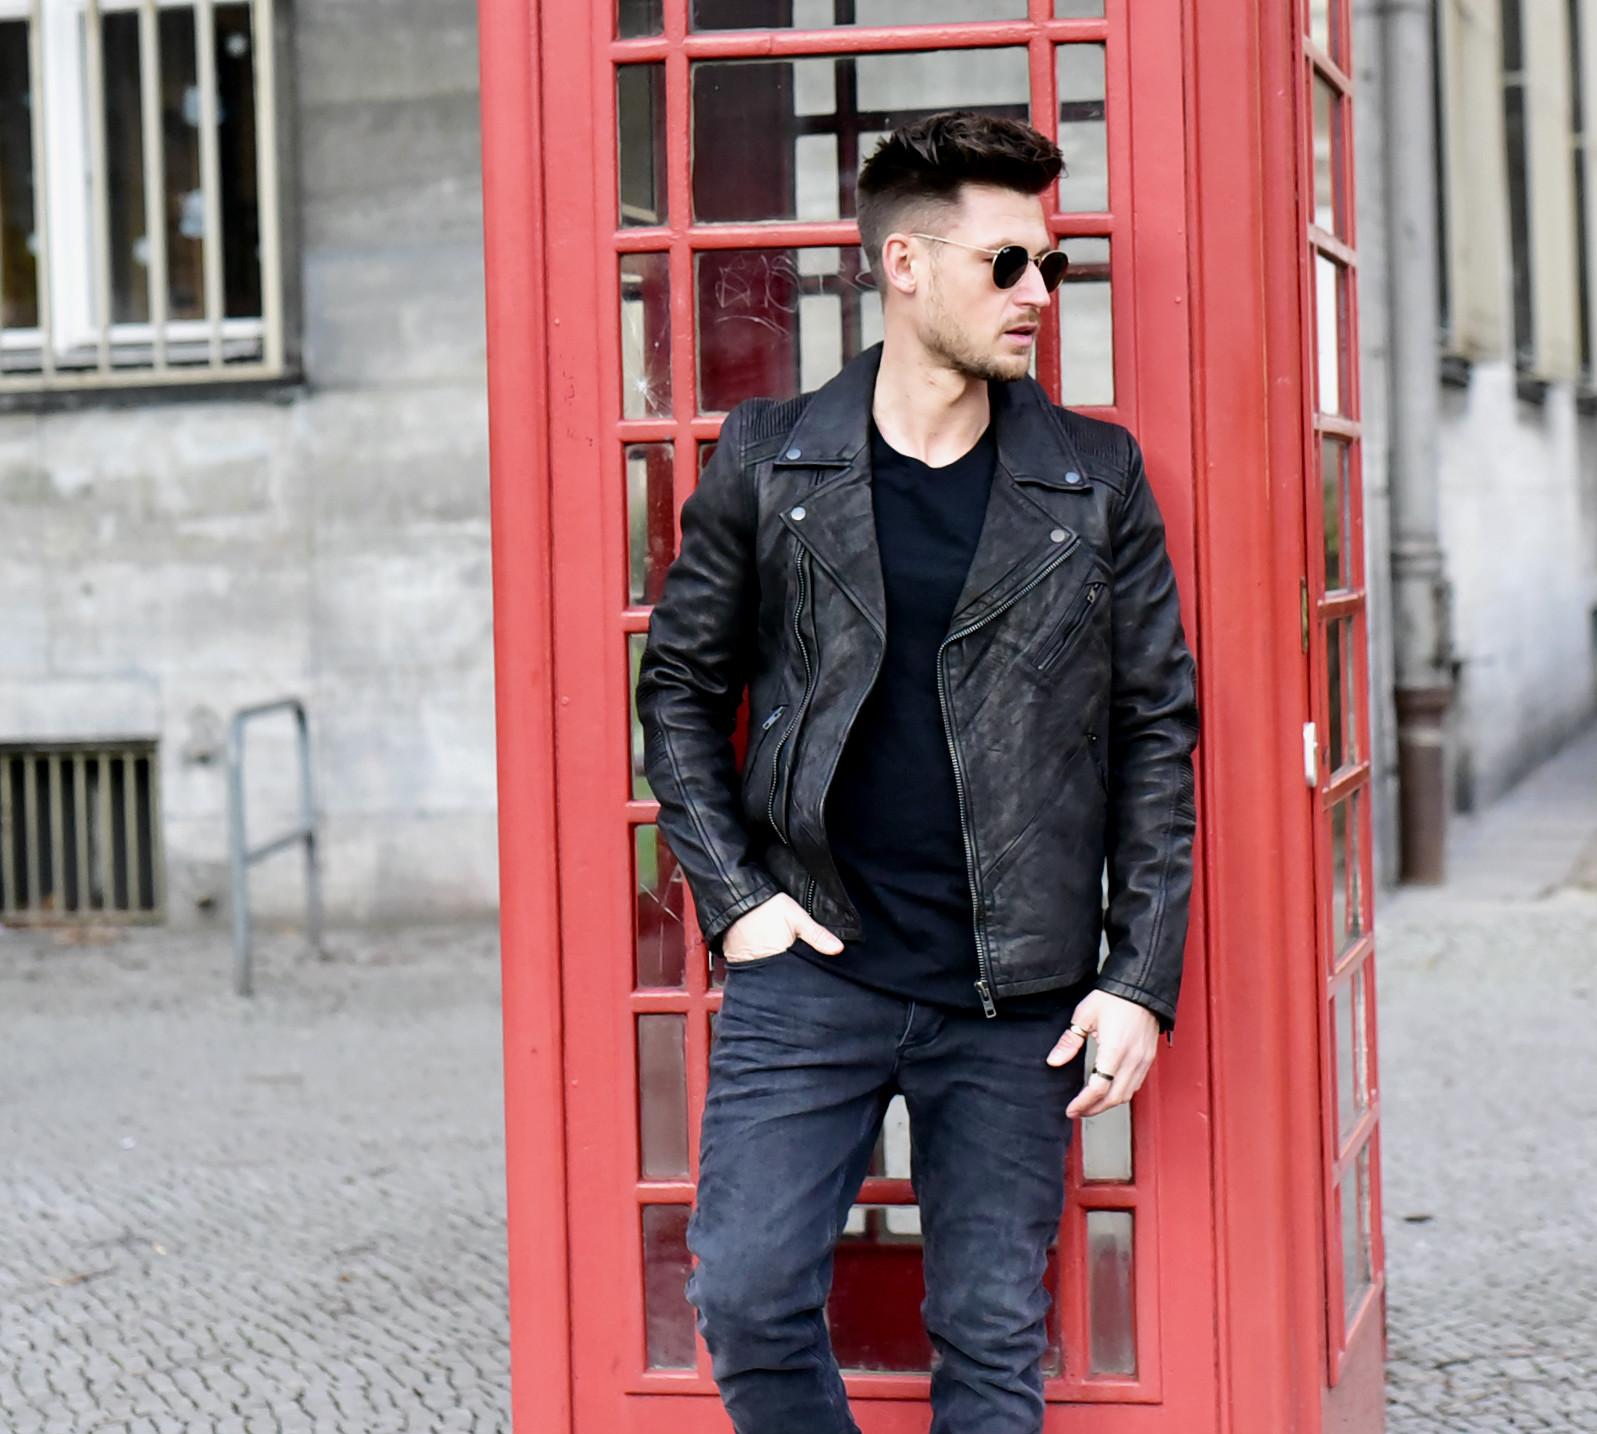 Tommeezjerry-Styleblog-Männerblog-Männer-Modeblog-Berlin-Berlinblog-Männermodeblog-Outfit-Gabba-Denim-Cheslea-Boots-Lederjacke-Streetlook